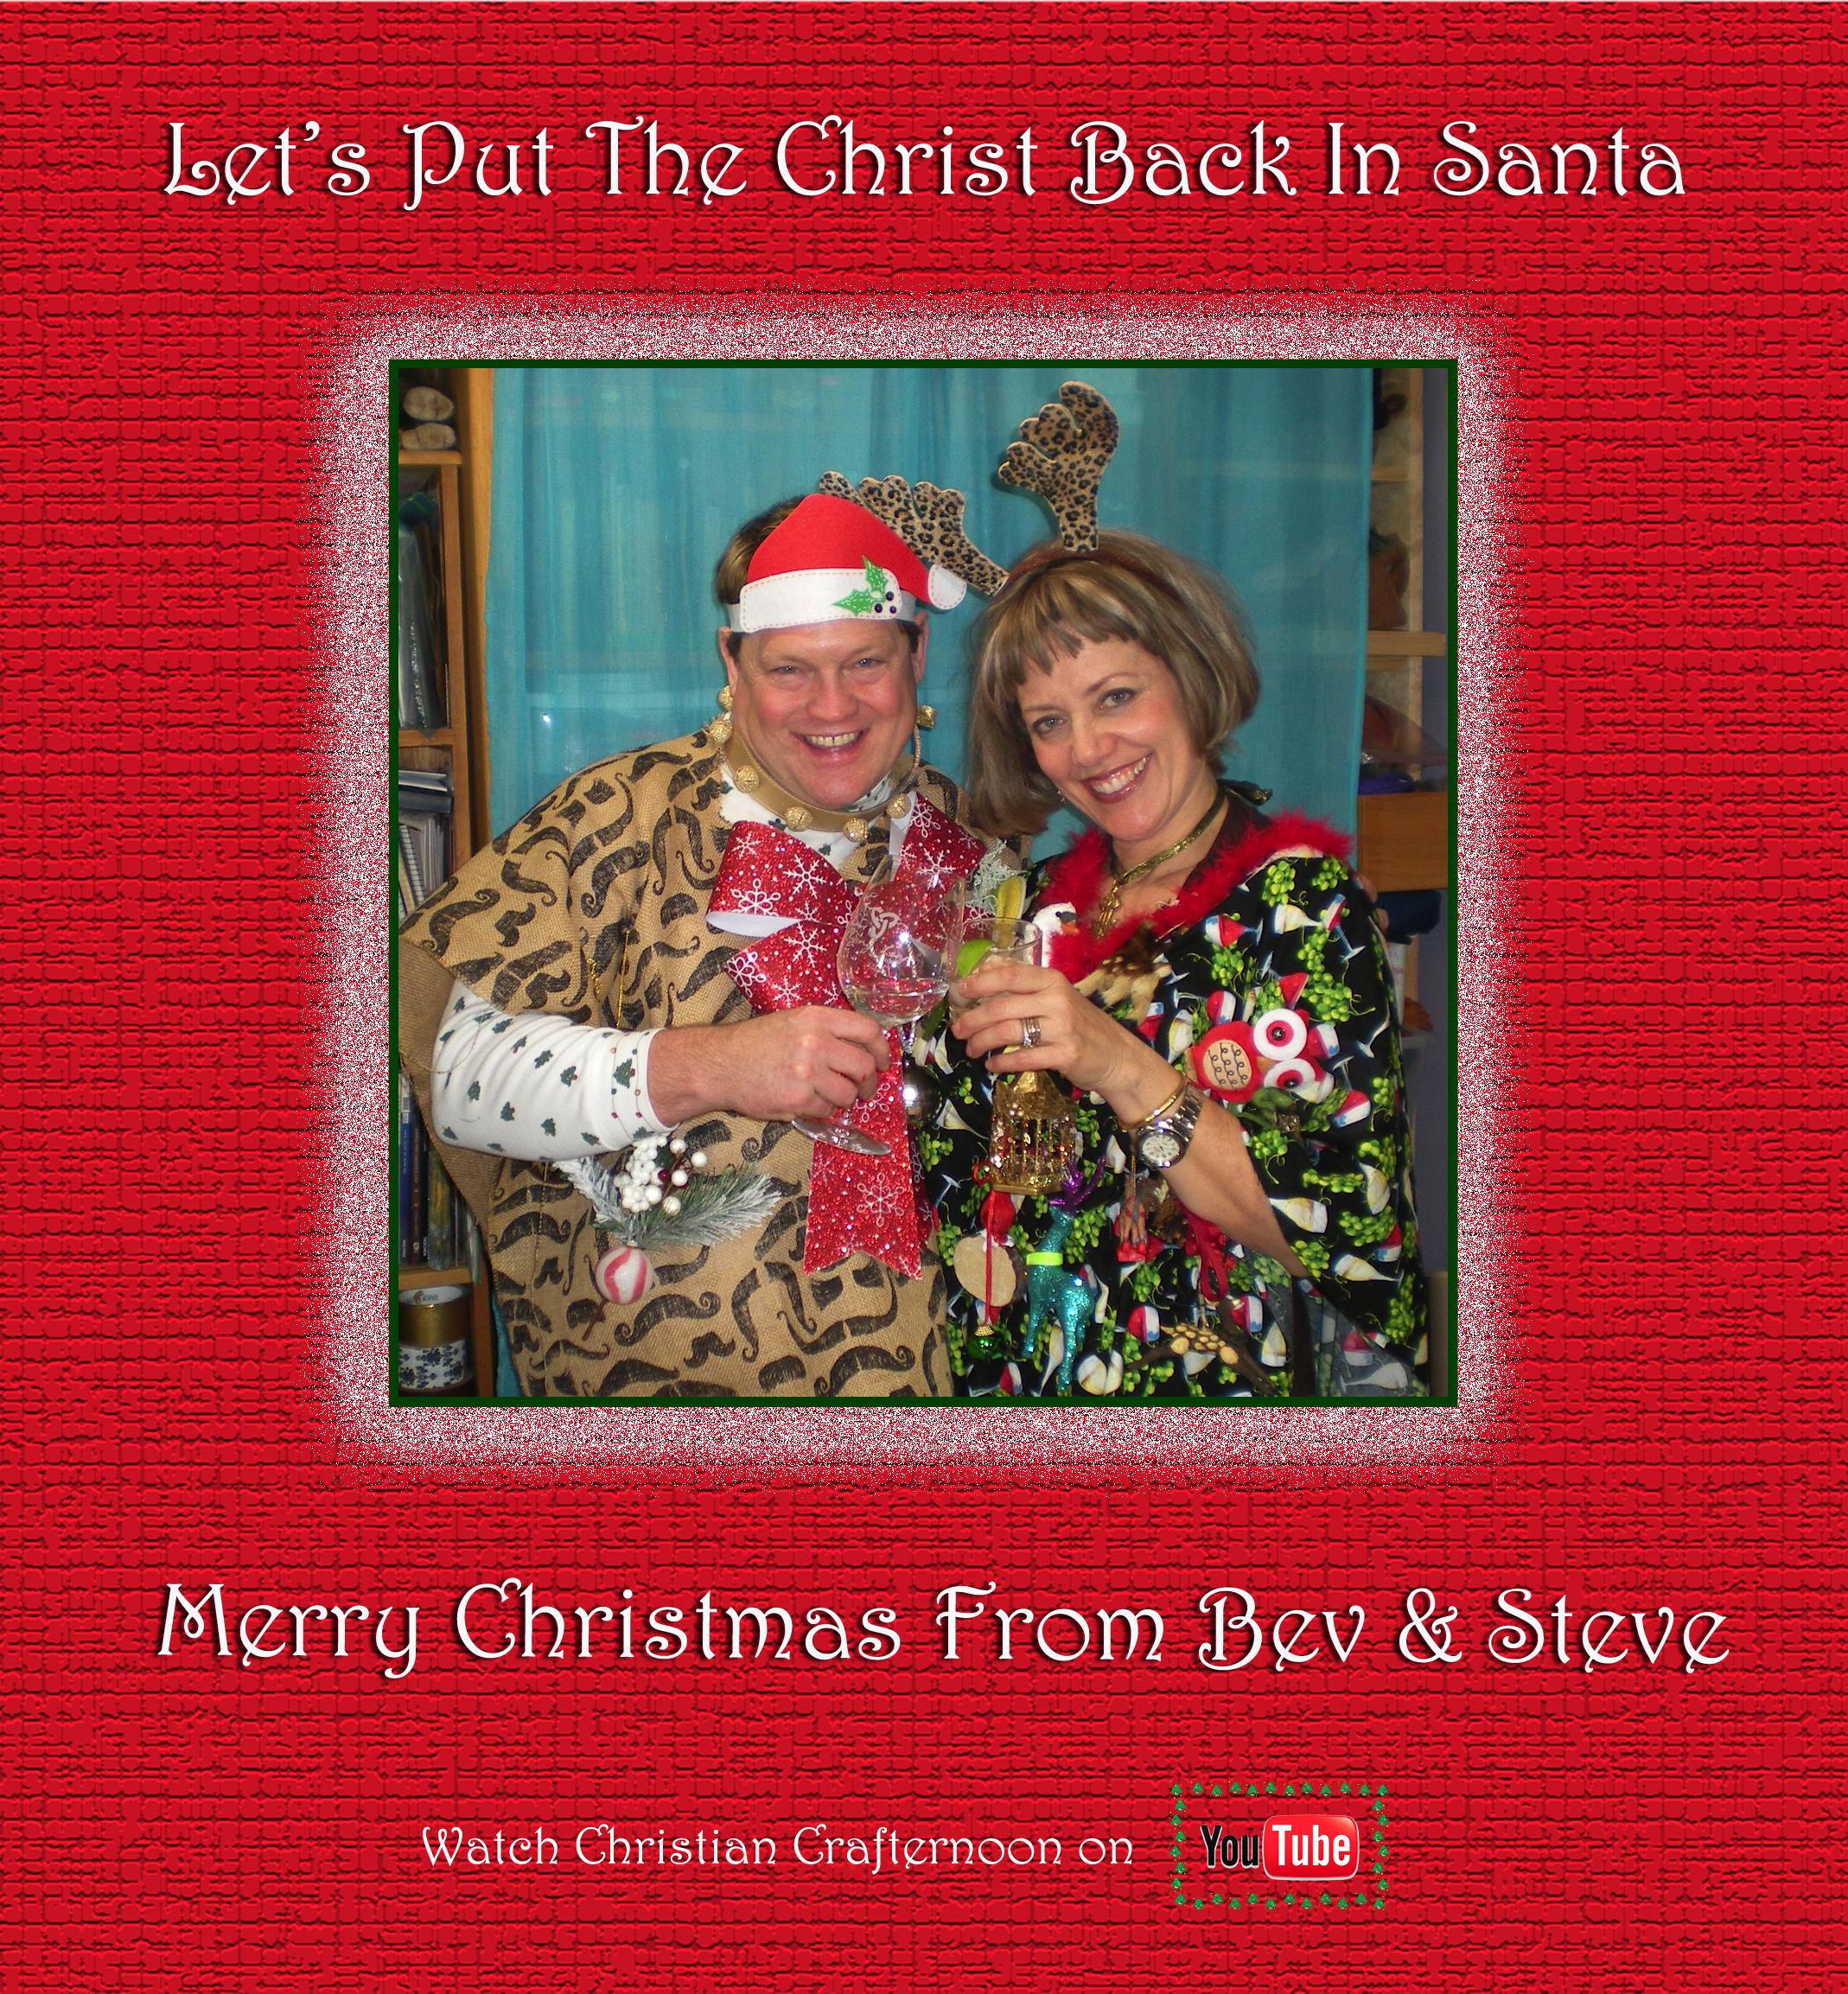 ChristmasCard2013-BevandSteve.jpg